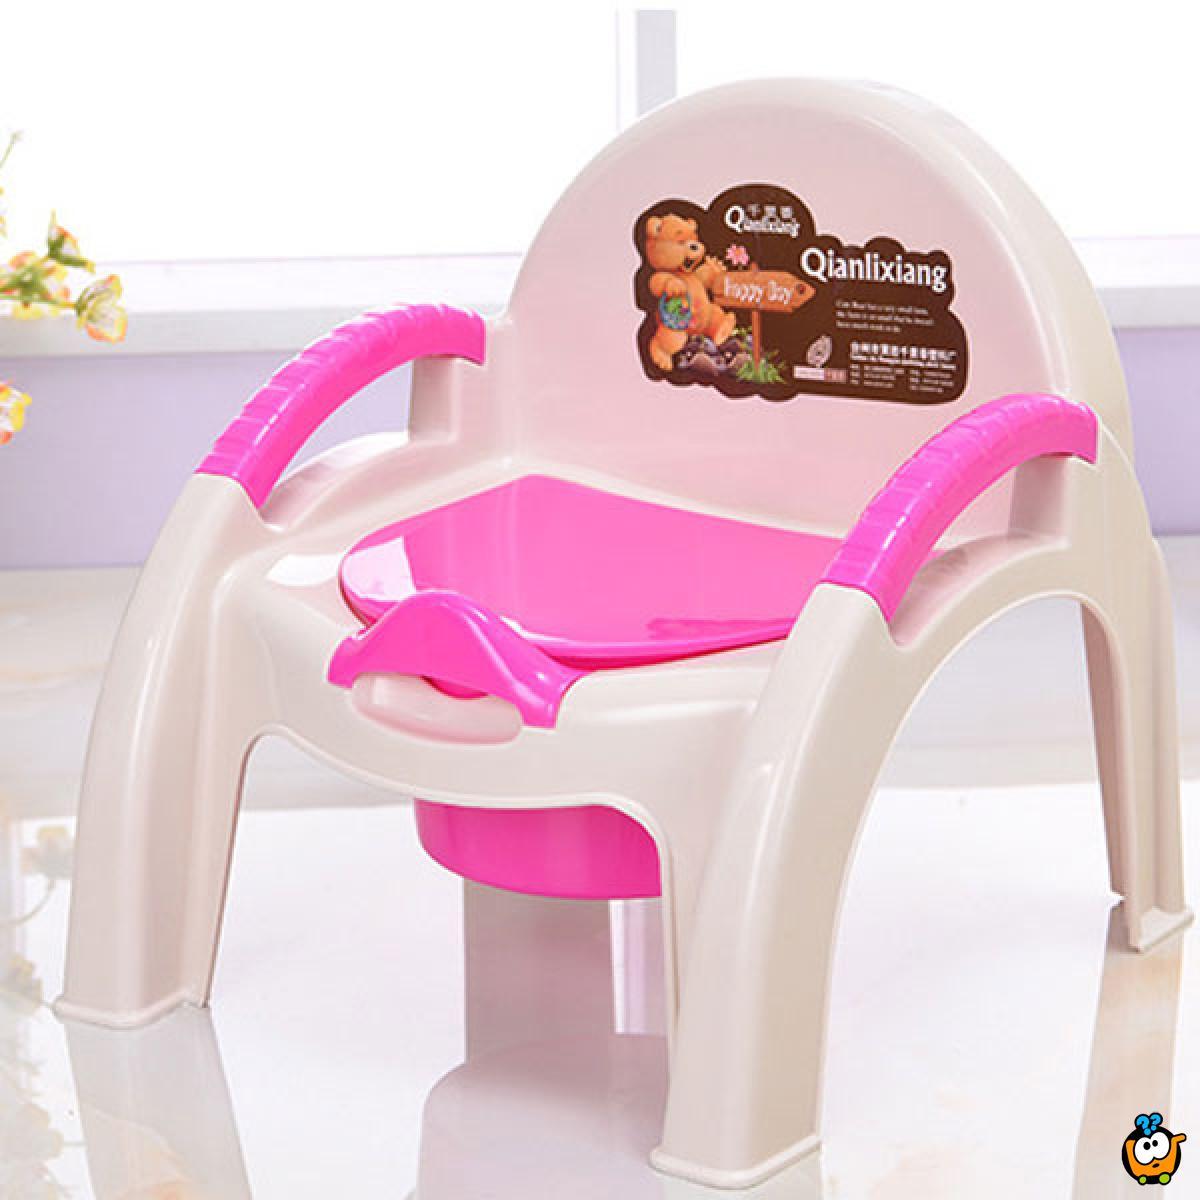 Potty chair - Noša u obliku stolice sa ručkama